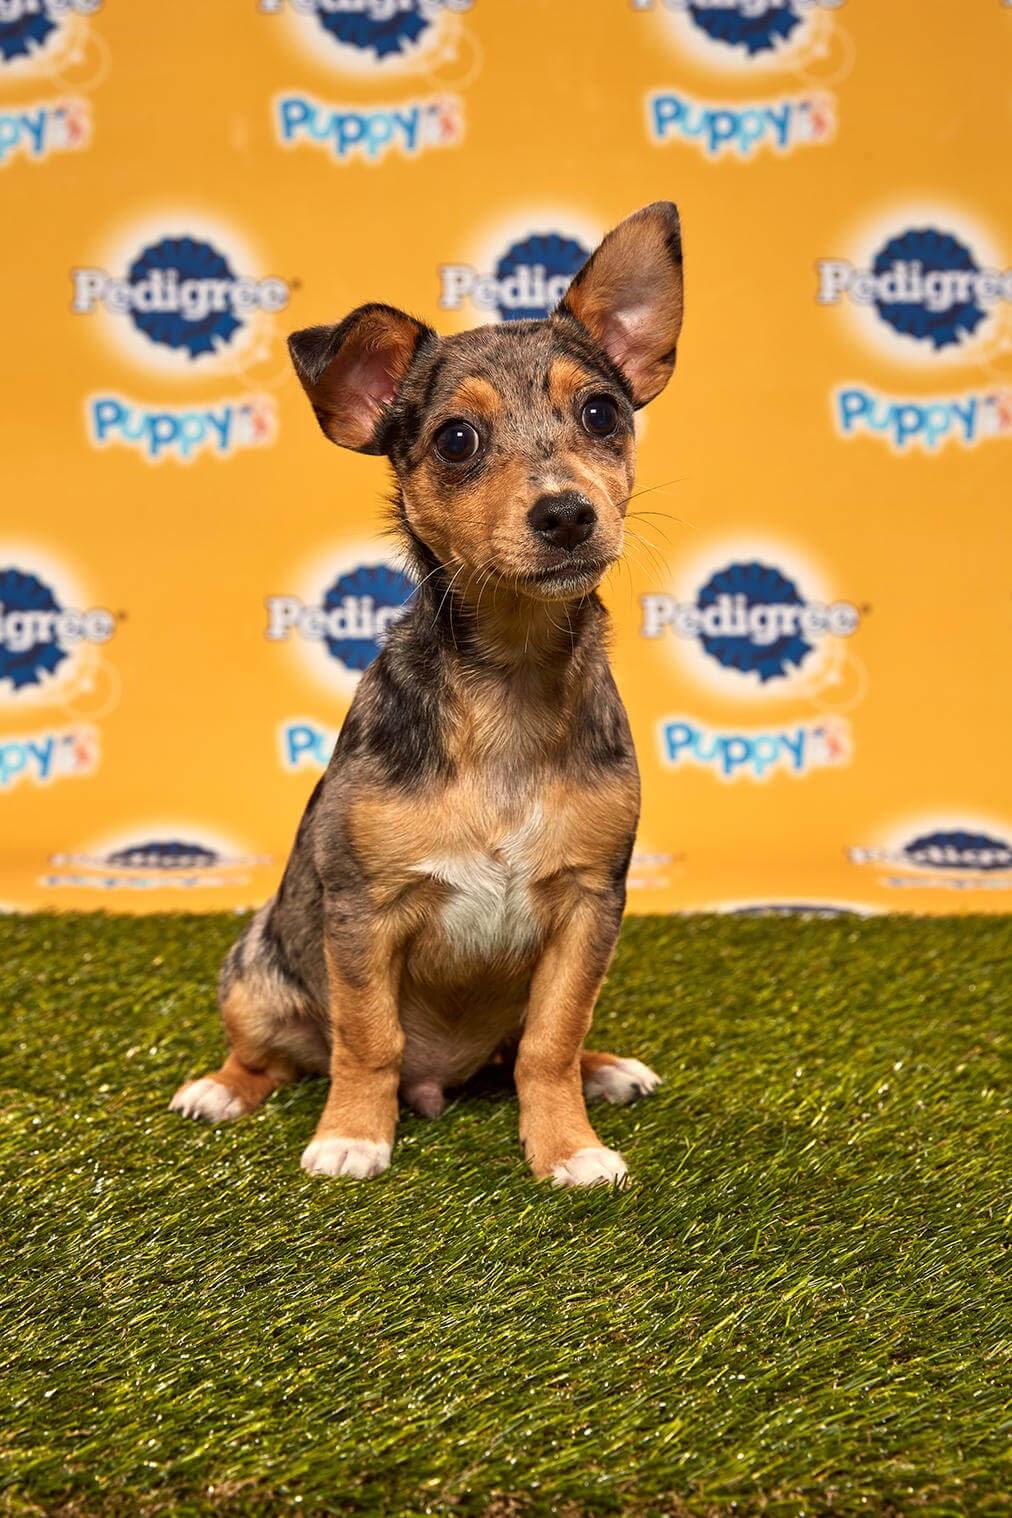 Brody dog - Animal planet